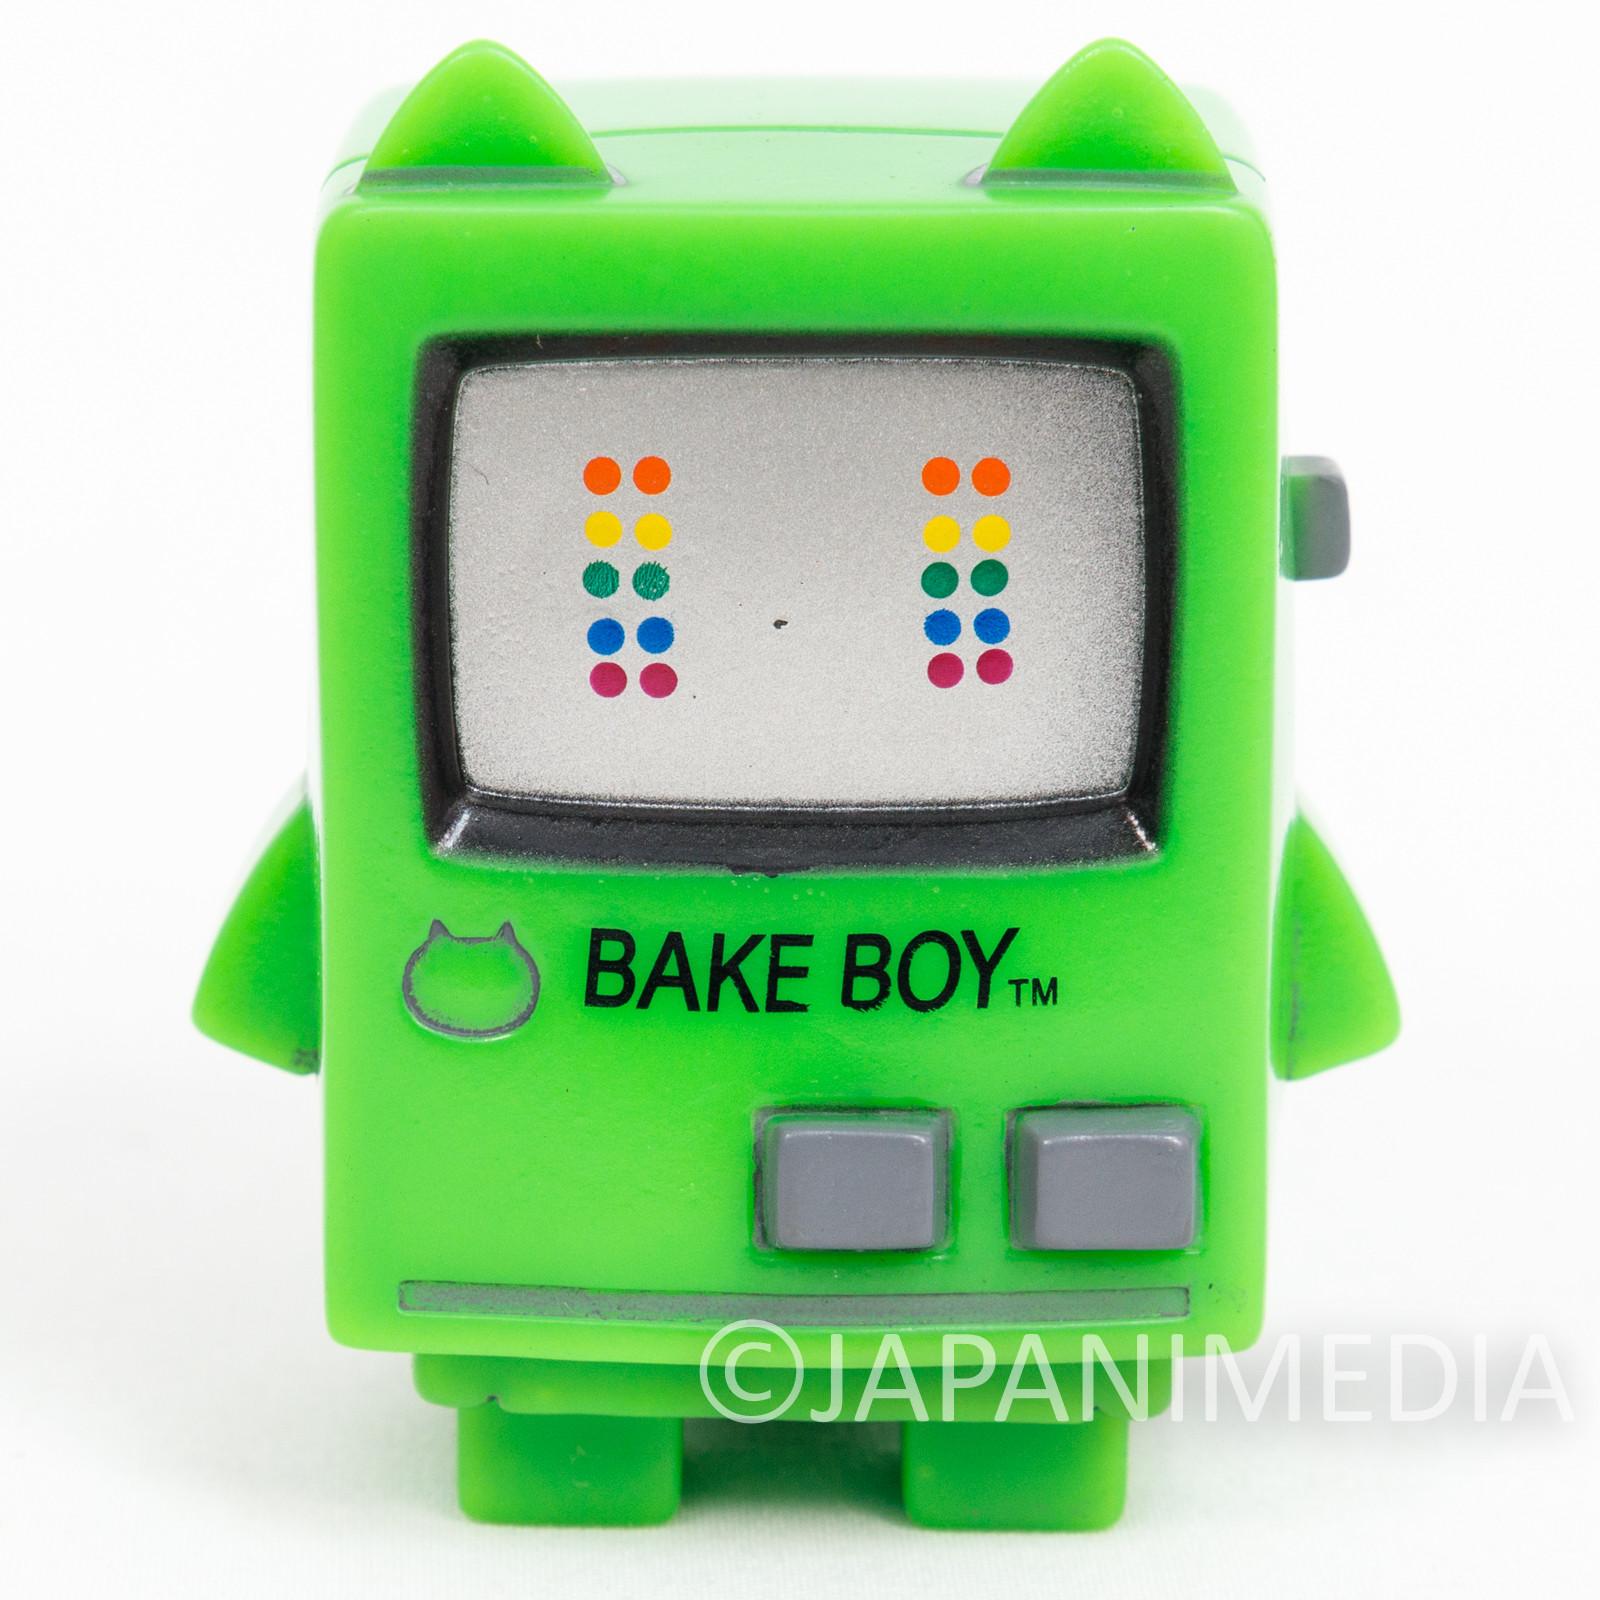 BAKETAN Green ver. Soft Vinyl Figure Medicom Toy VAG Series JAPAN